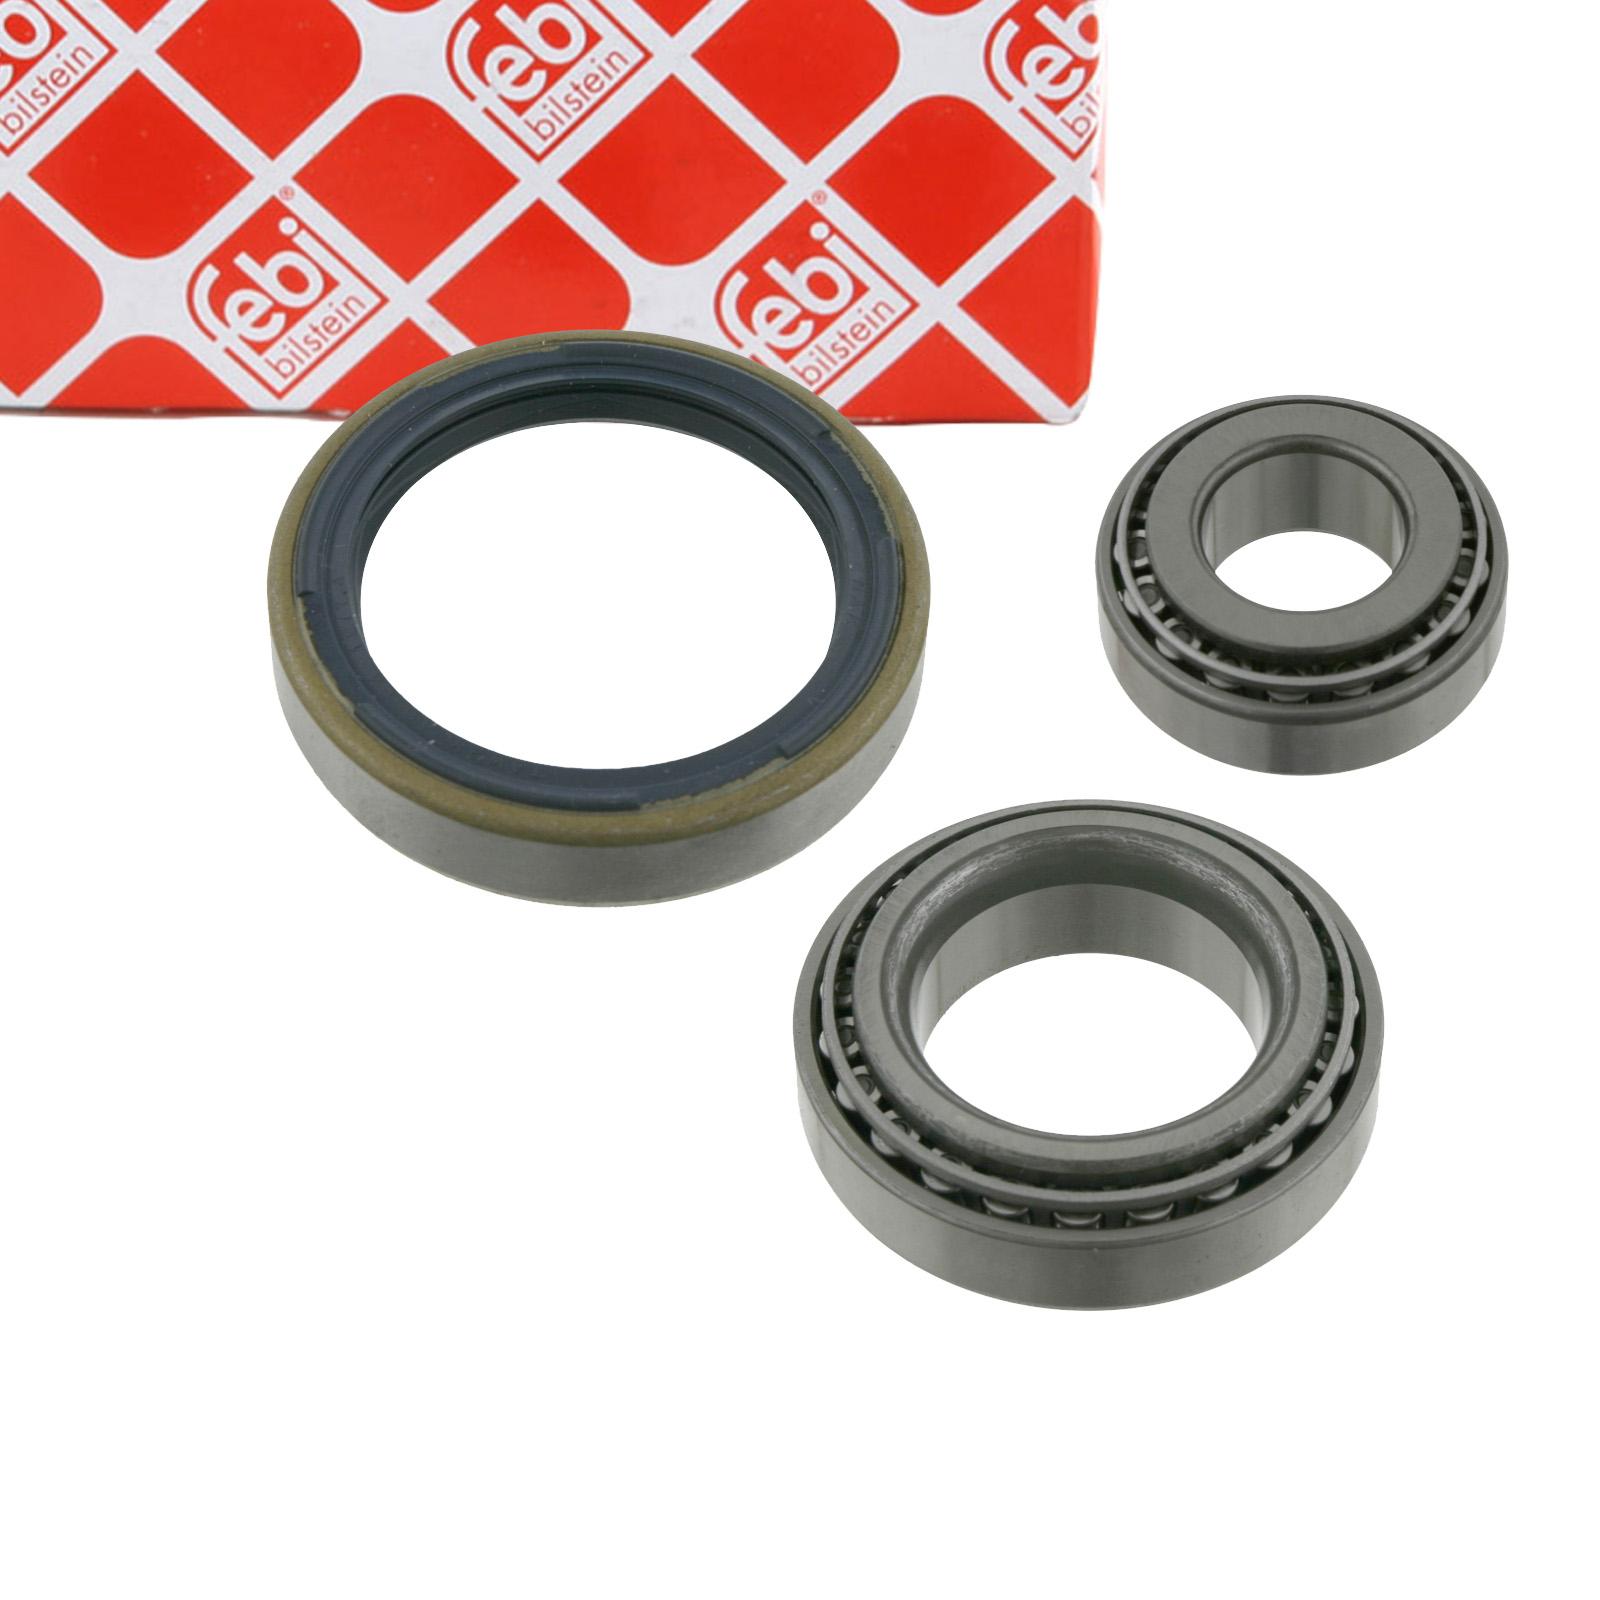 FEBI 07870 Radlagersatz Radlager MERCEDES 190 W201 W202 W210 W124 SLK R170 CLK C208 vorne